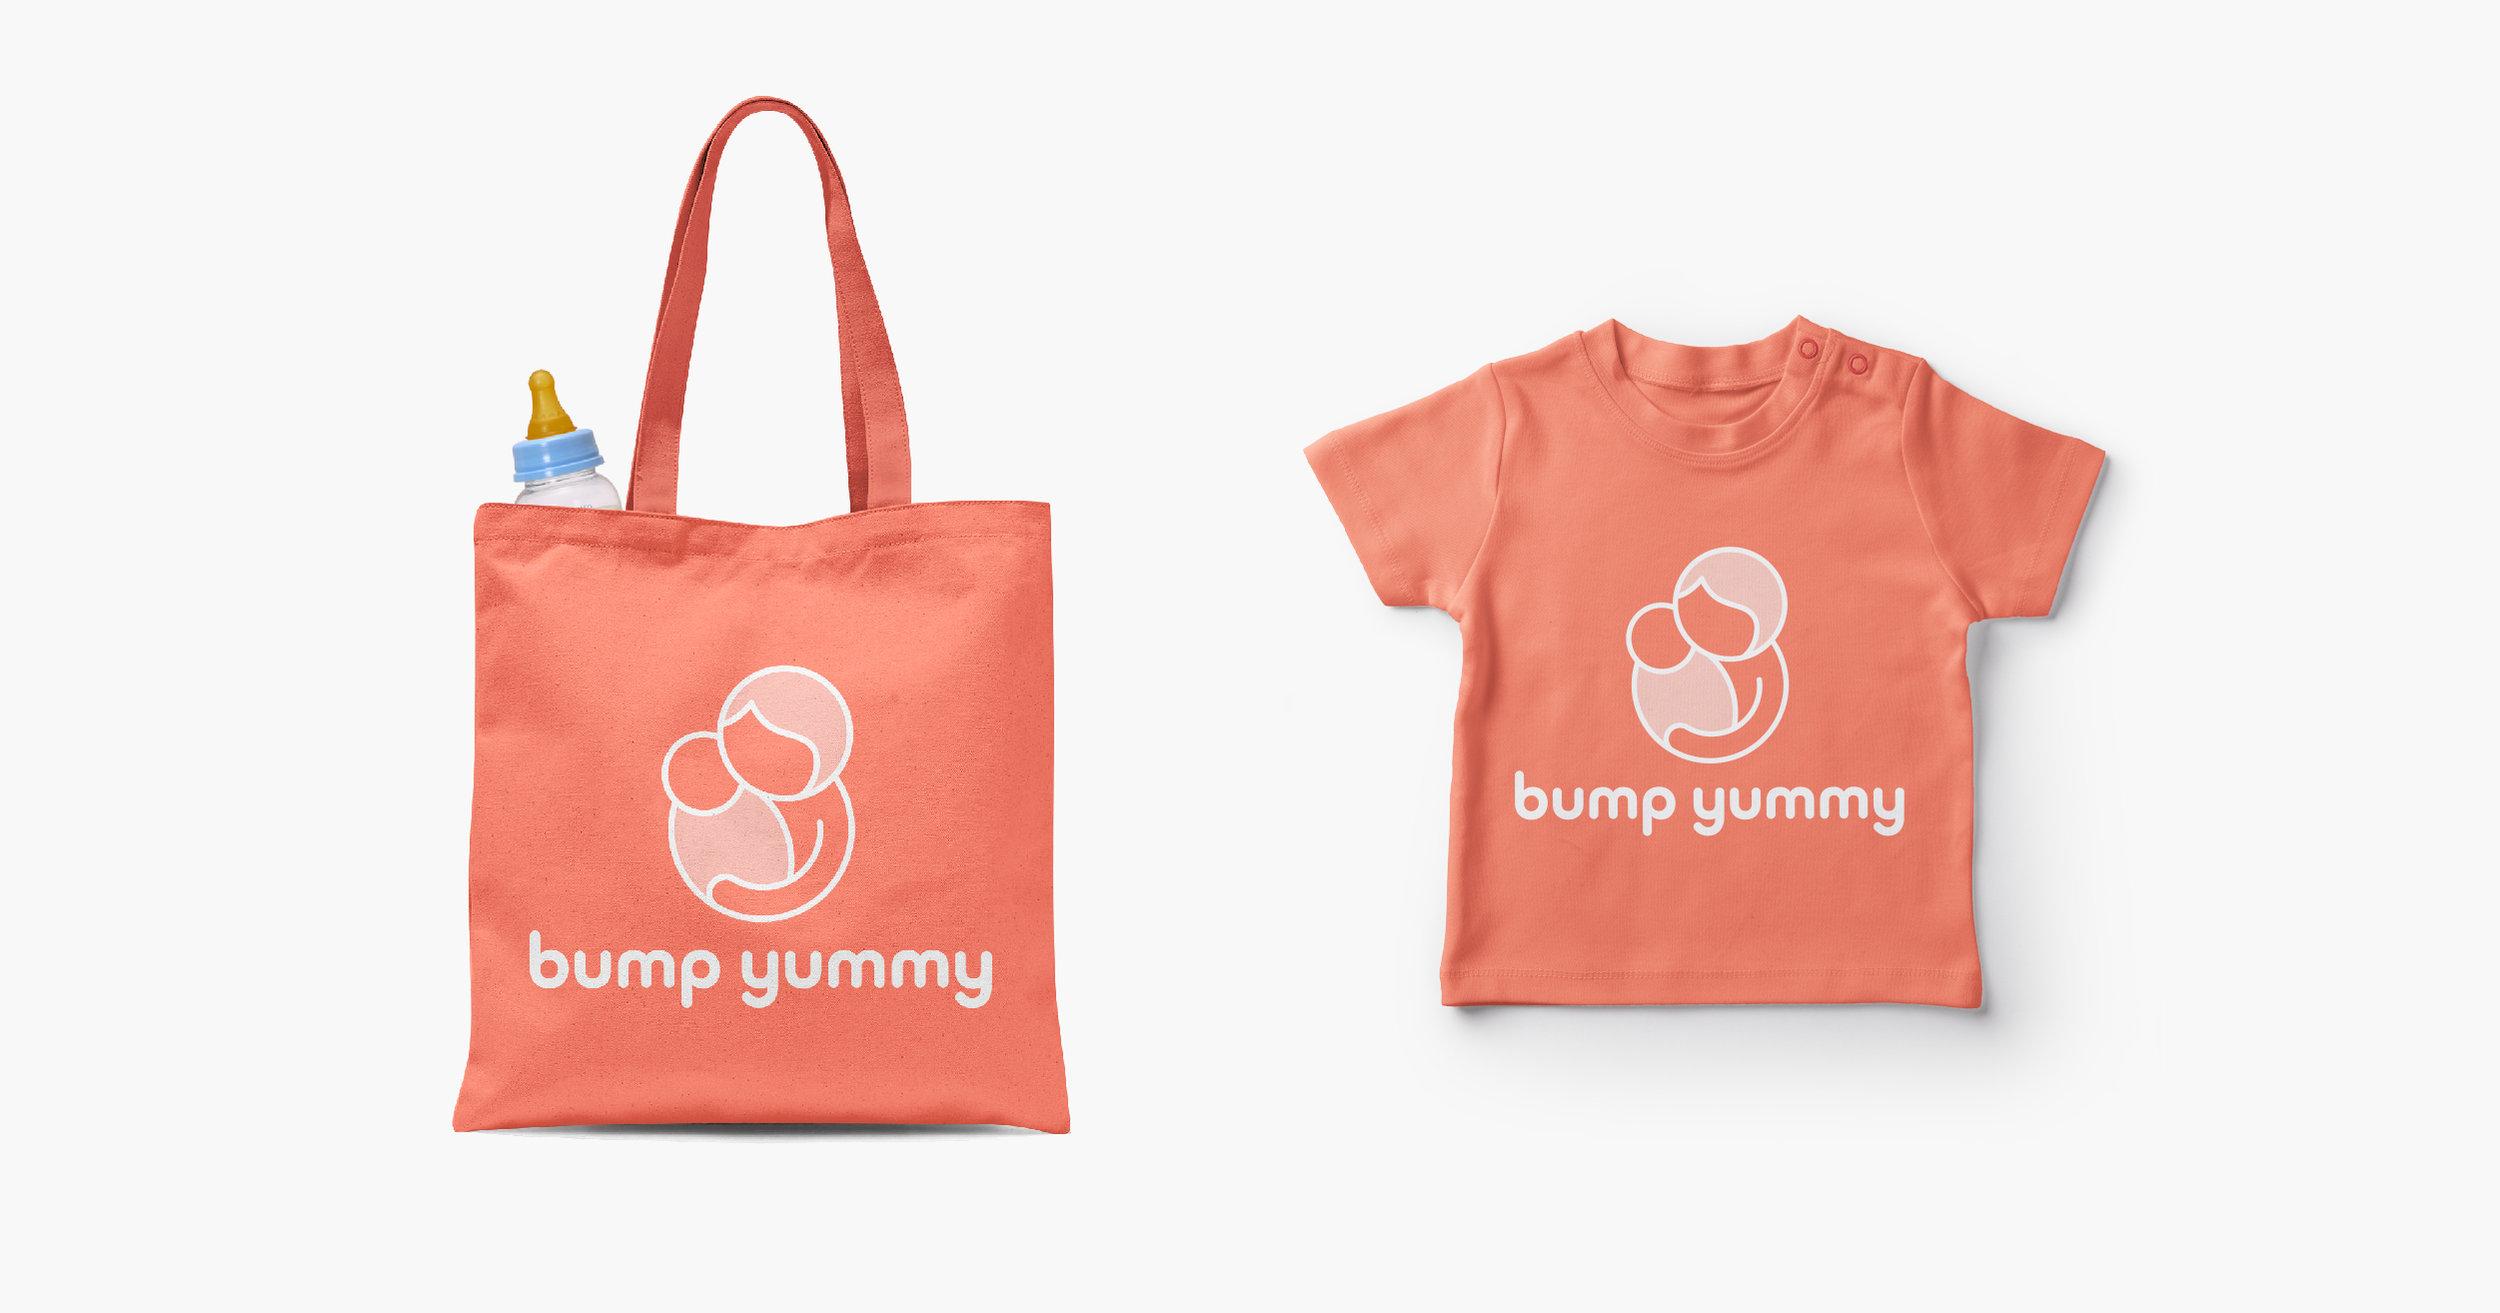 BumpYummyWeb-31.jpg